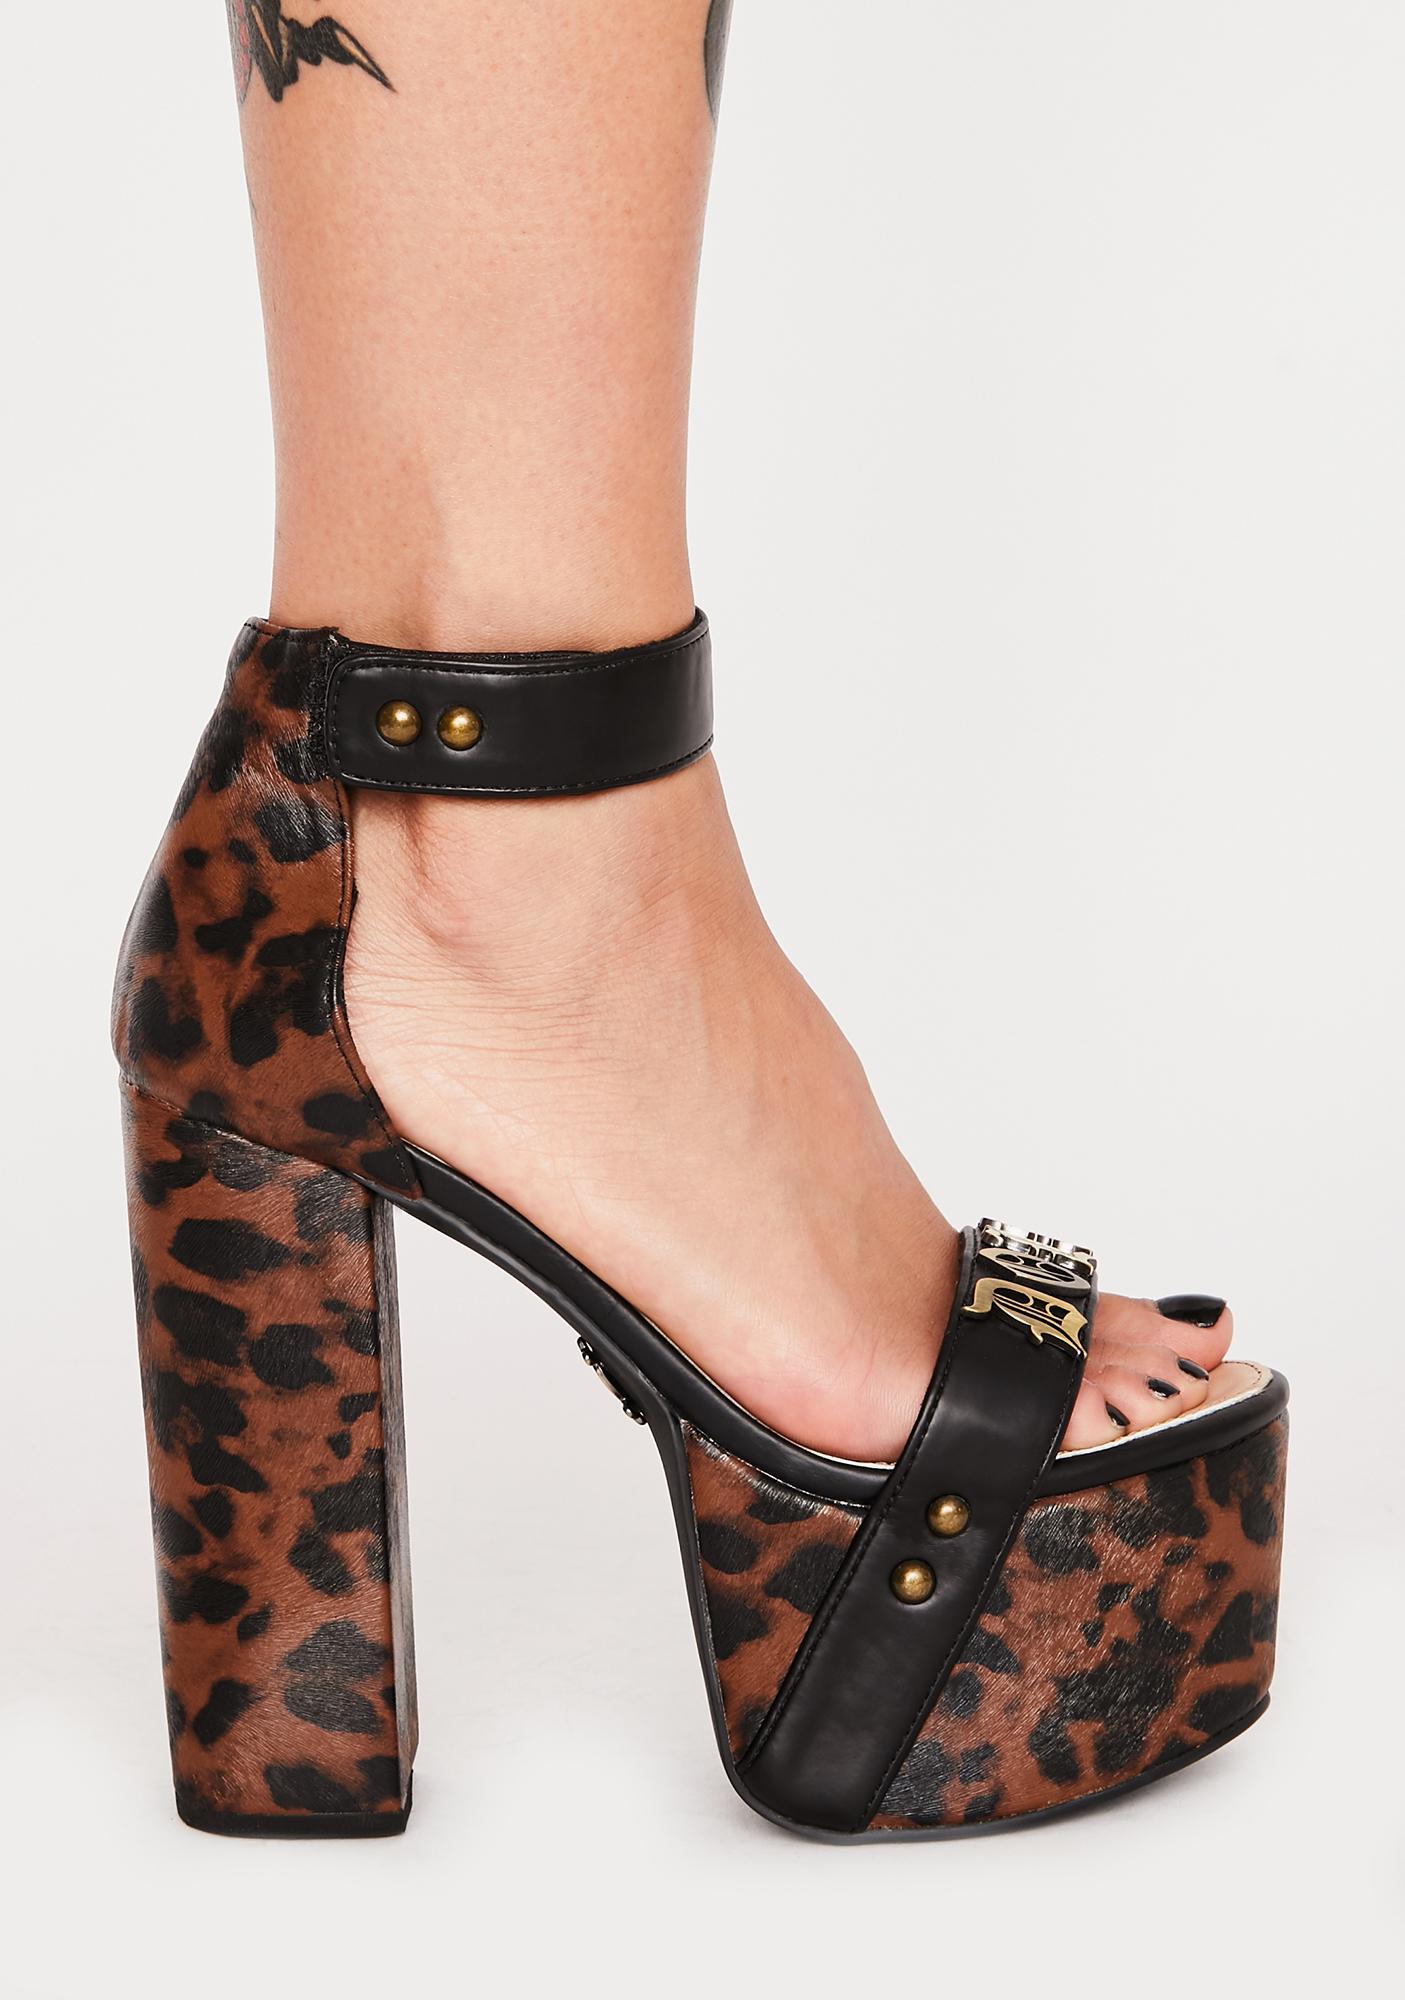 Charla Tedrick Dollface Platform Heels